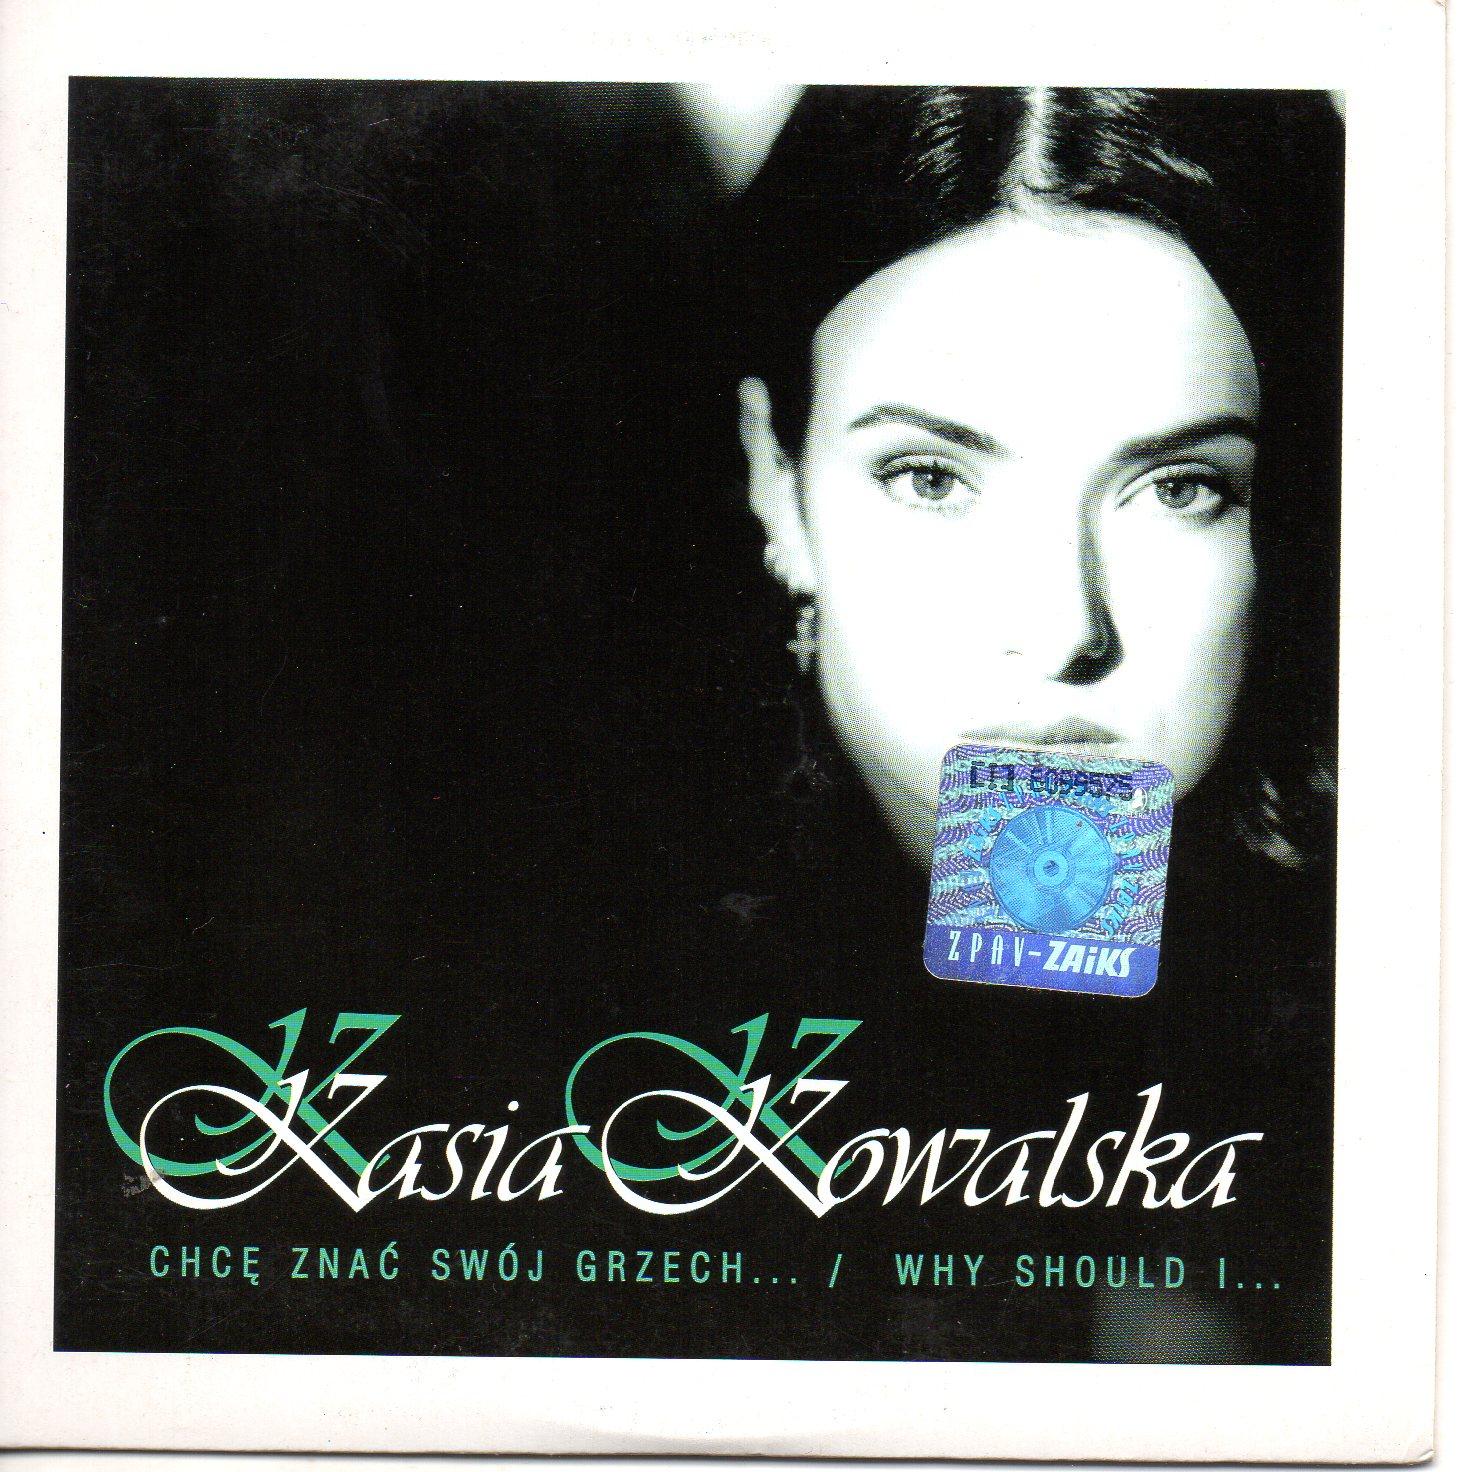 EUROVISION 1996 POLOGNE : KASIA KOWALSKA - Chc? Zna? Swój Grzech... 3-track CARD SLEEVE - CD single